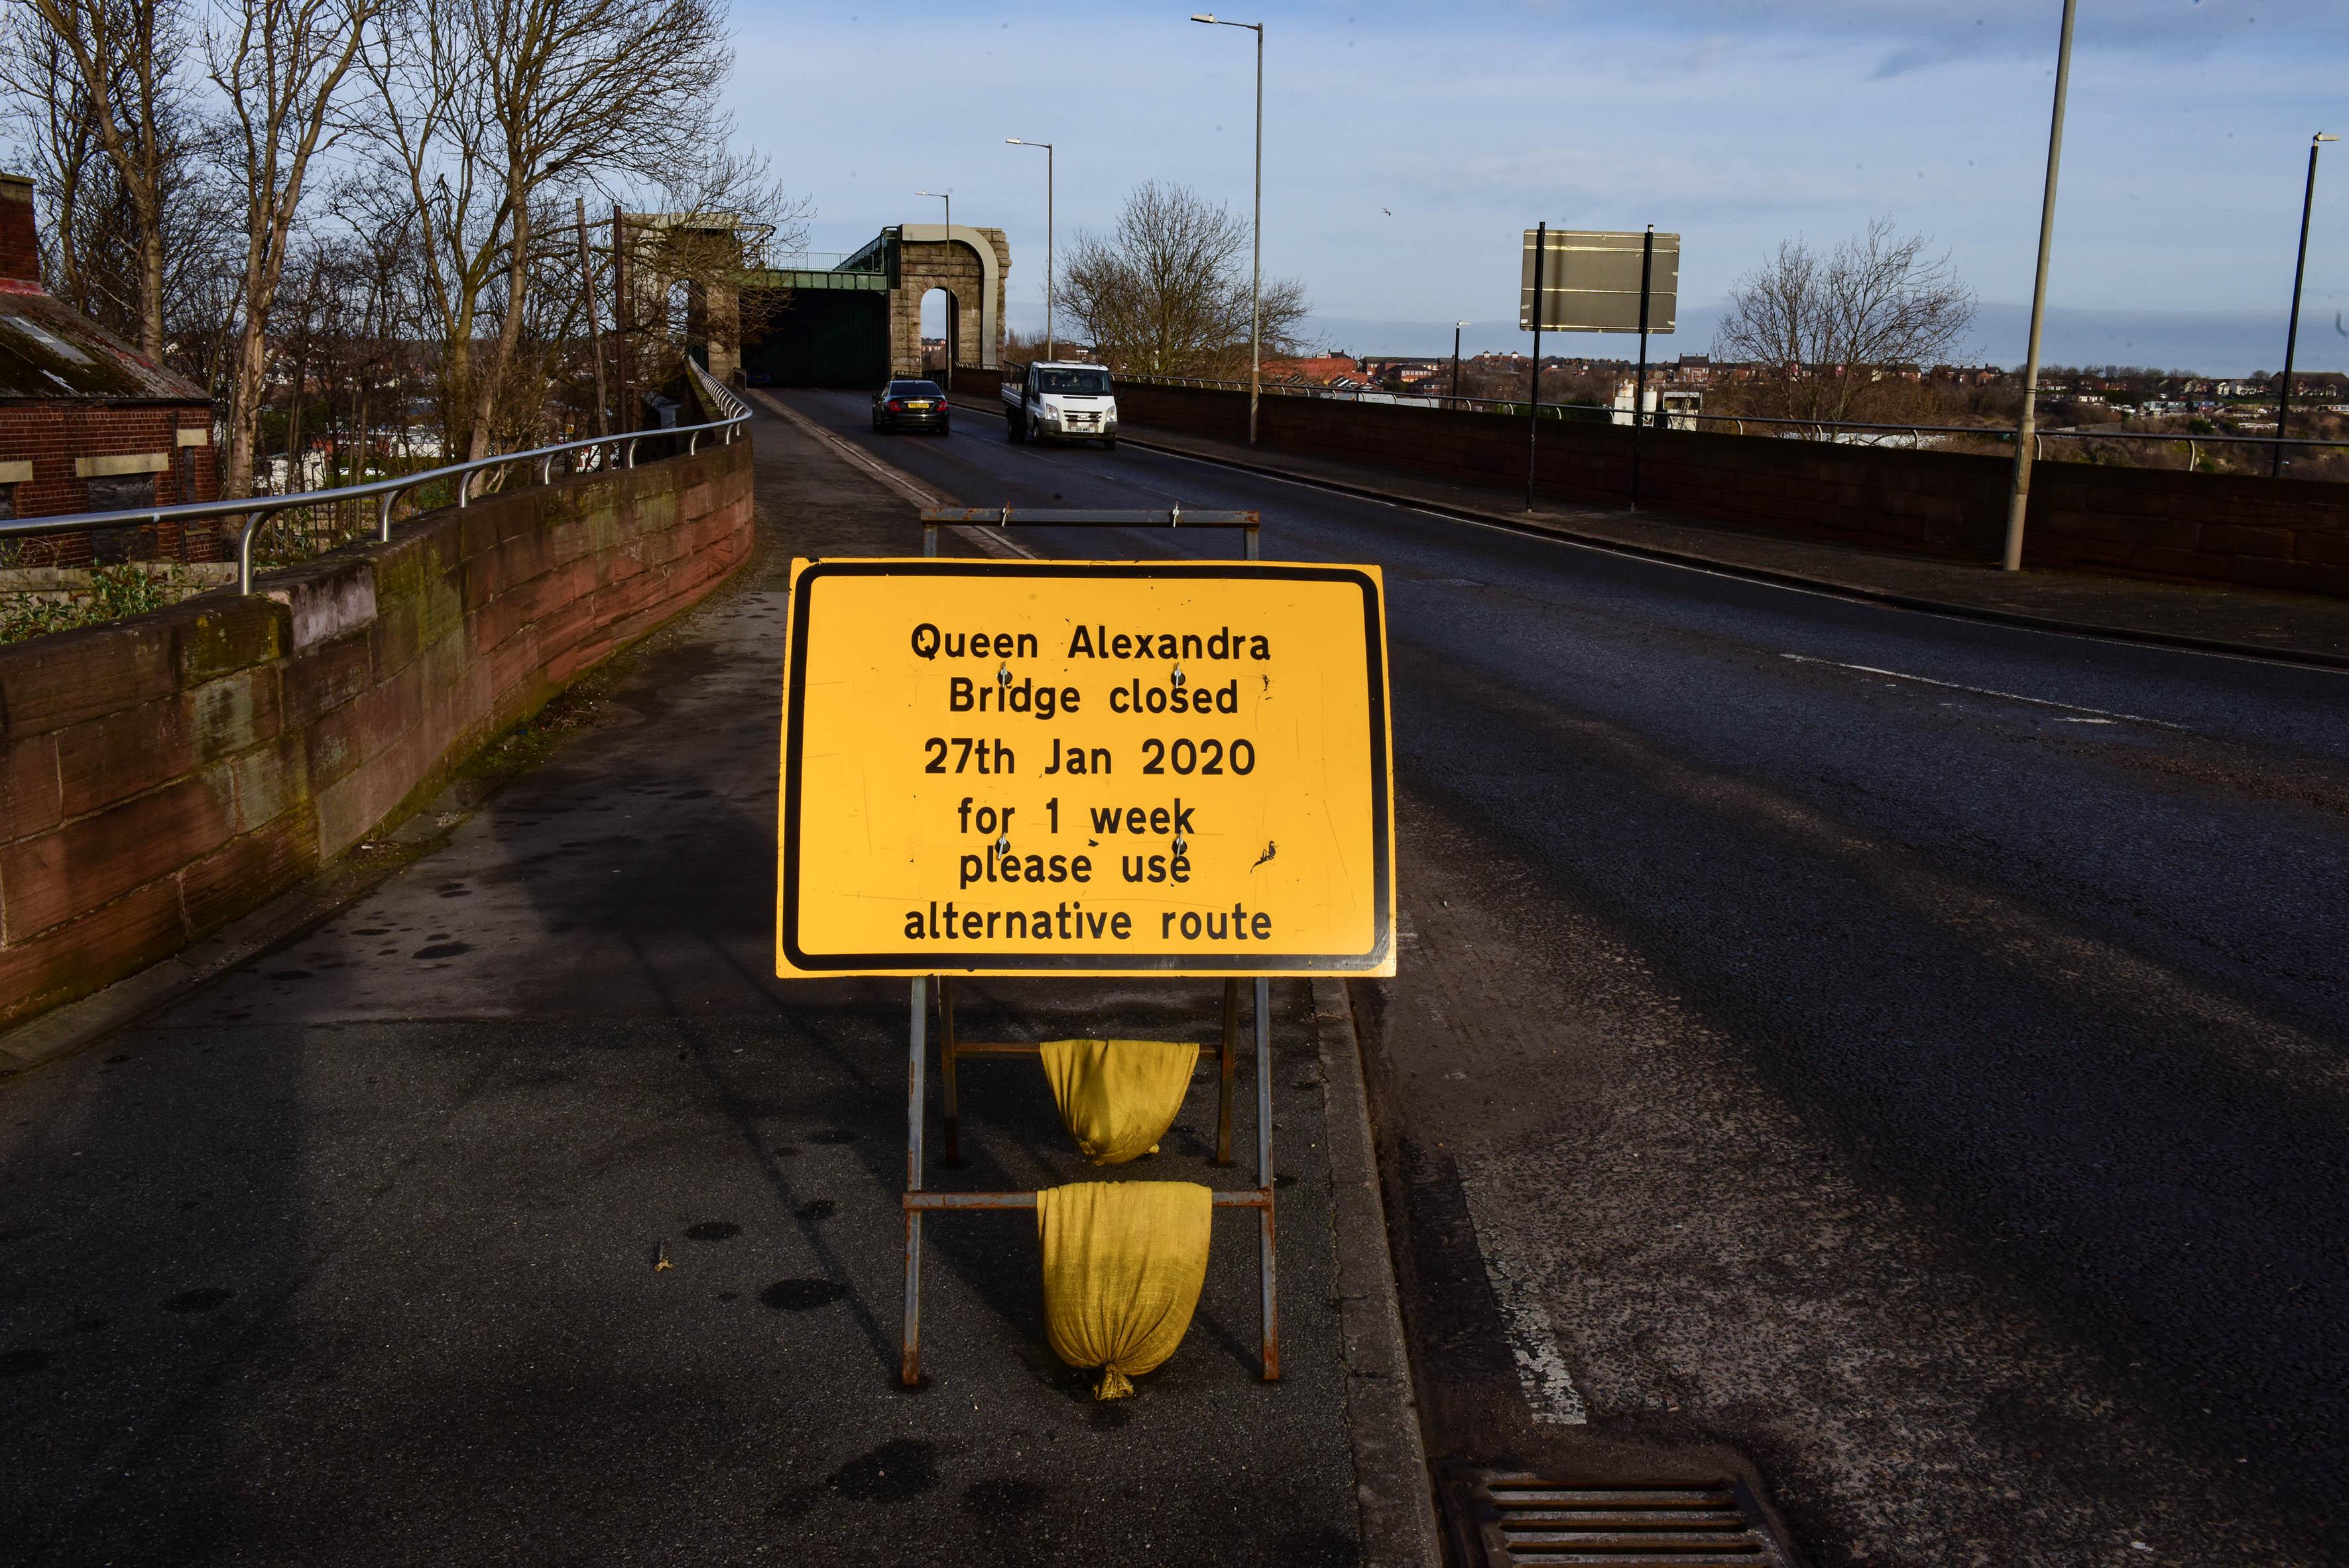 Queen Alexandra Bridge one week traffic closure image